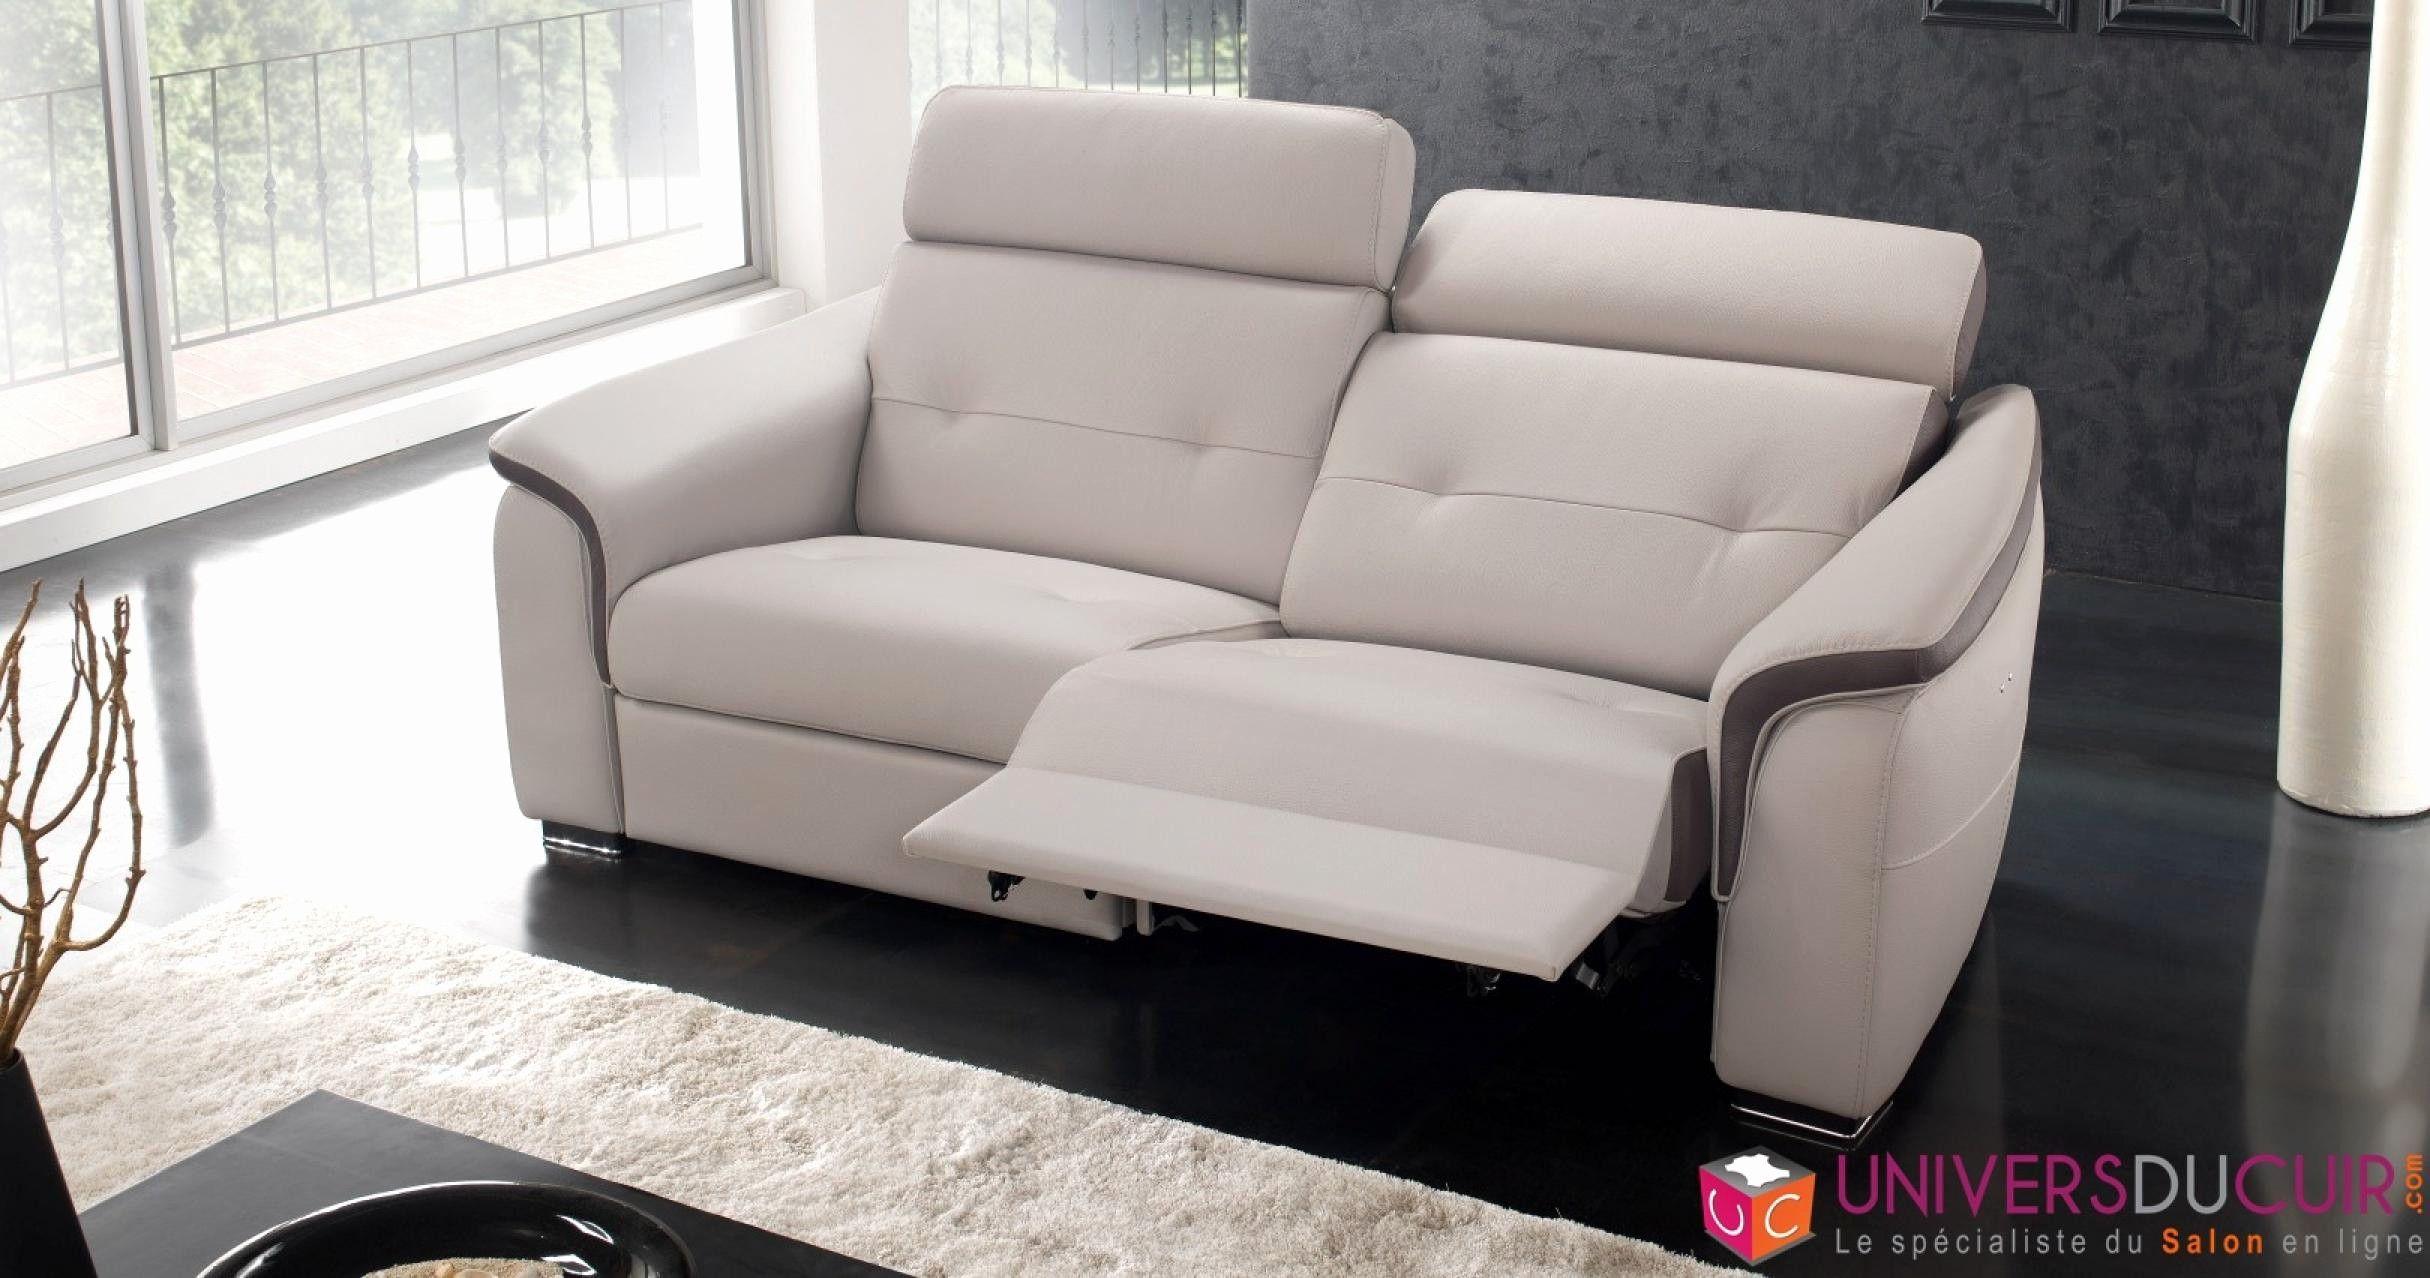 30 Luxe Cdiscount Canape Relax Idees Astucieuses Ide Dekorasi Rumah